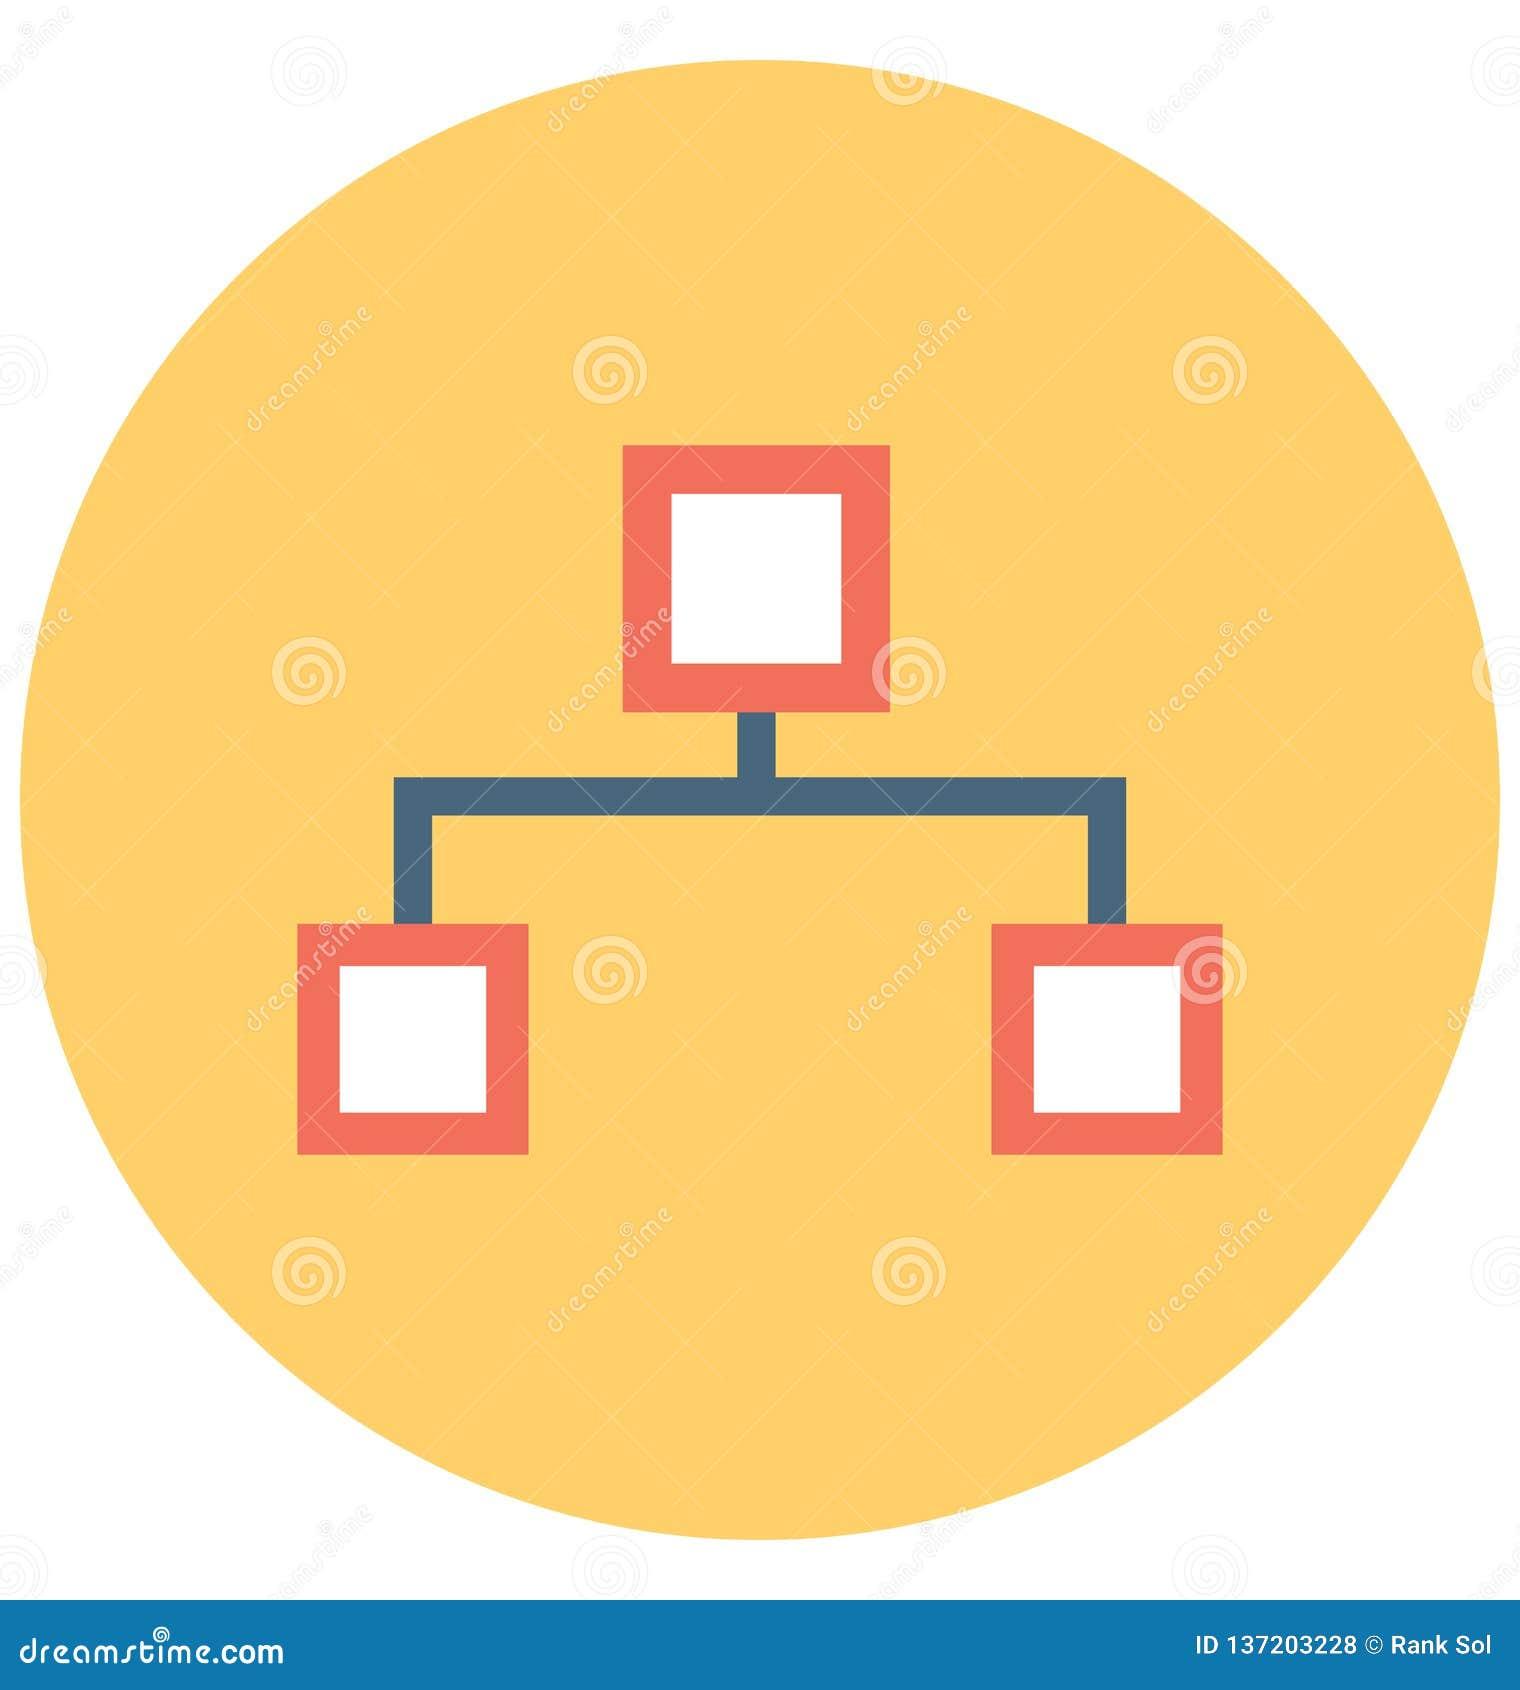 Sitemap isolou o ícone do vetor que pode facilmente ser alterado ou editado